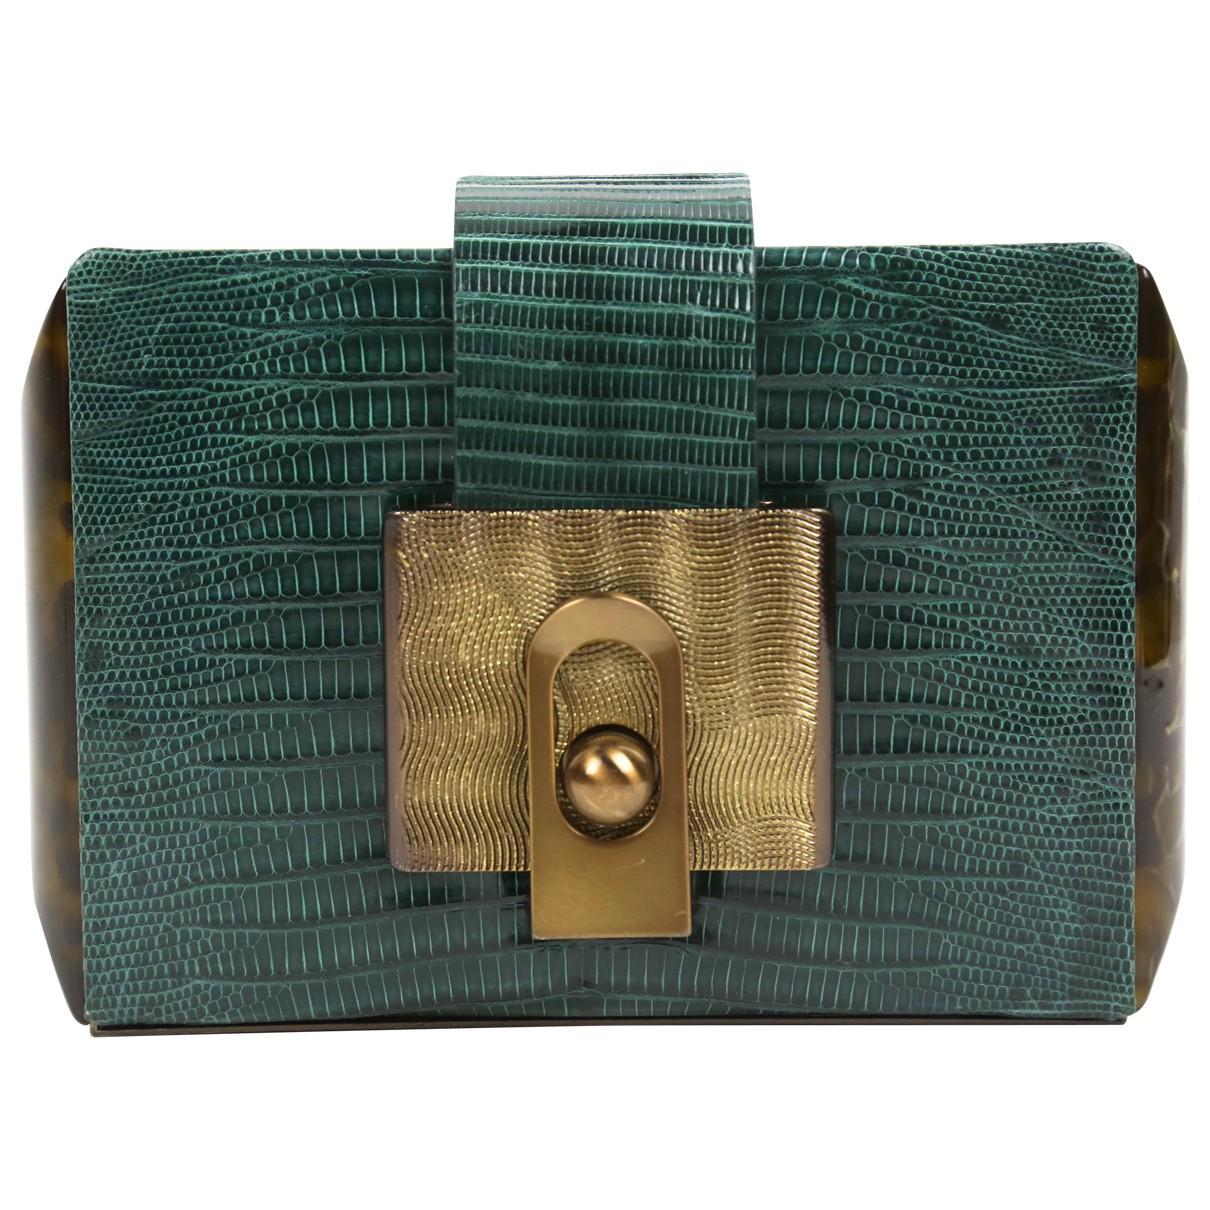 Lanvin Pre-owned - Lizard clutch bag ICnedl